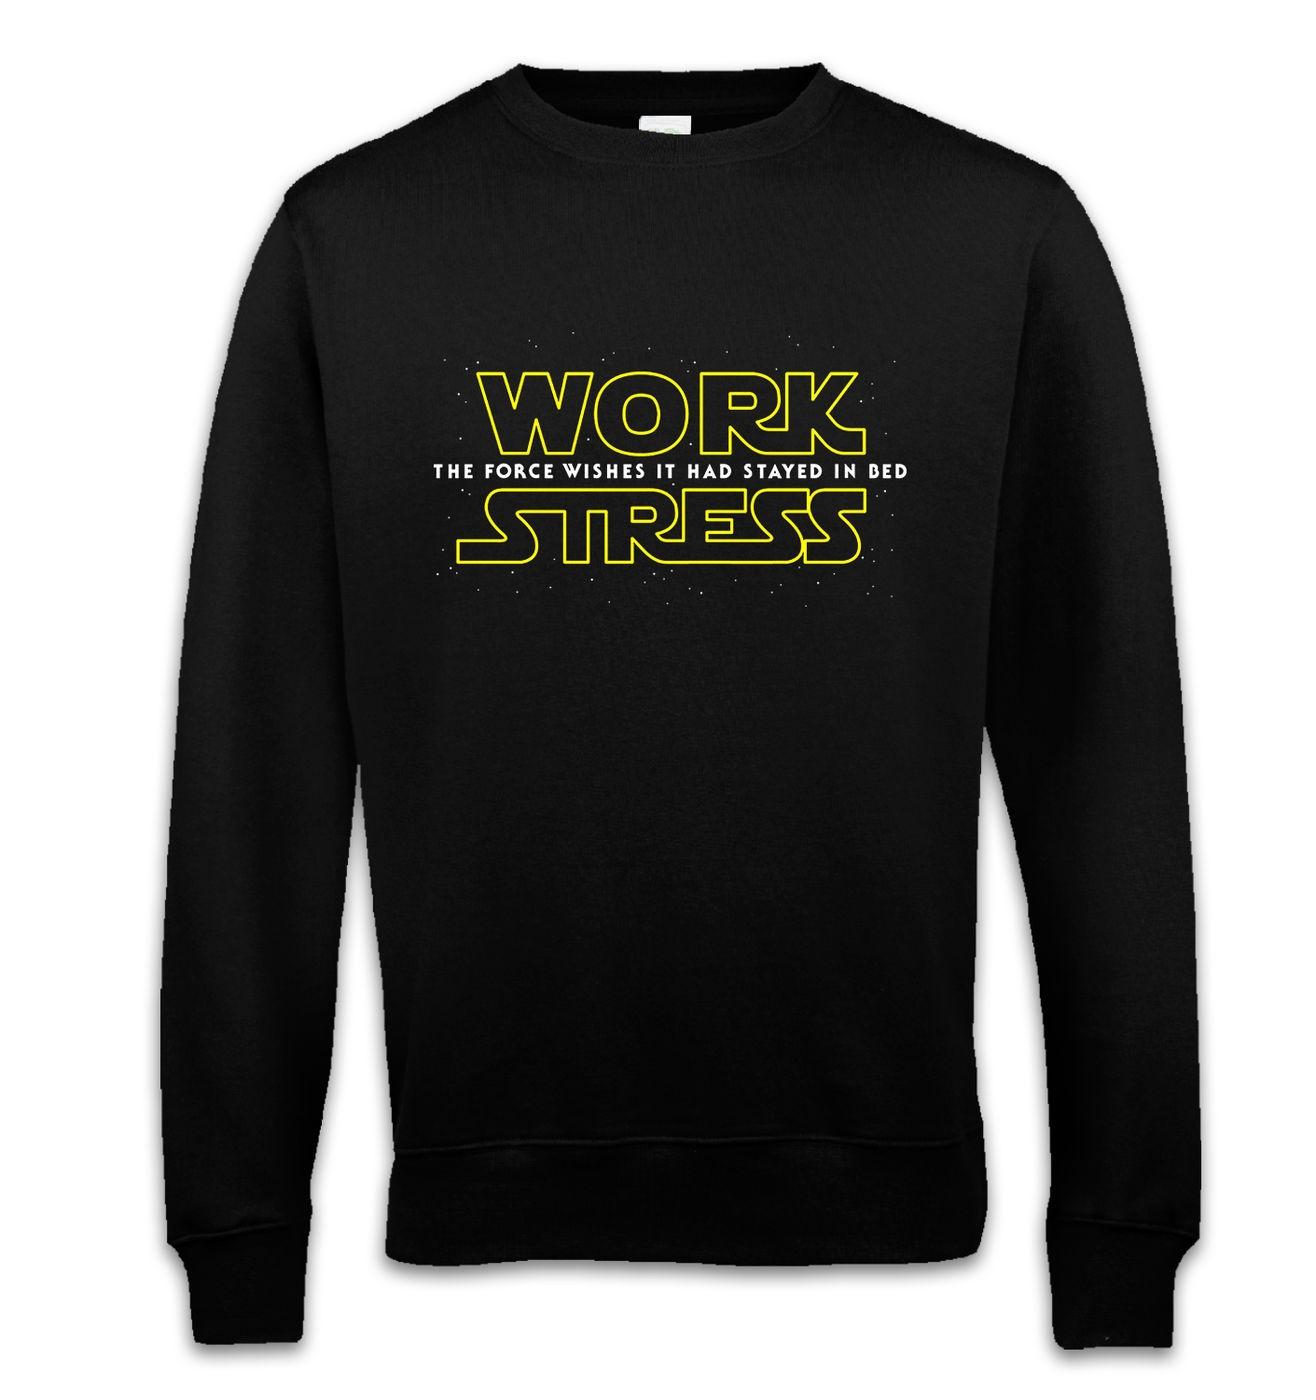 Work Stress sweatshirt - Star Wars The Force Awakens parody sweater